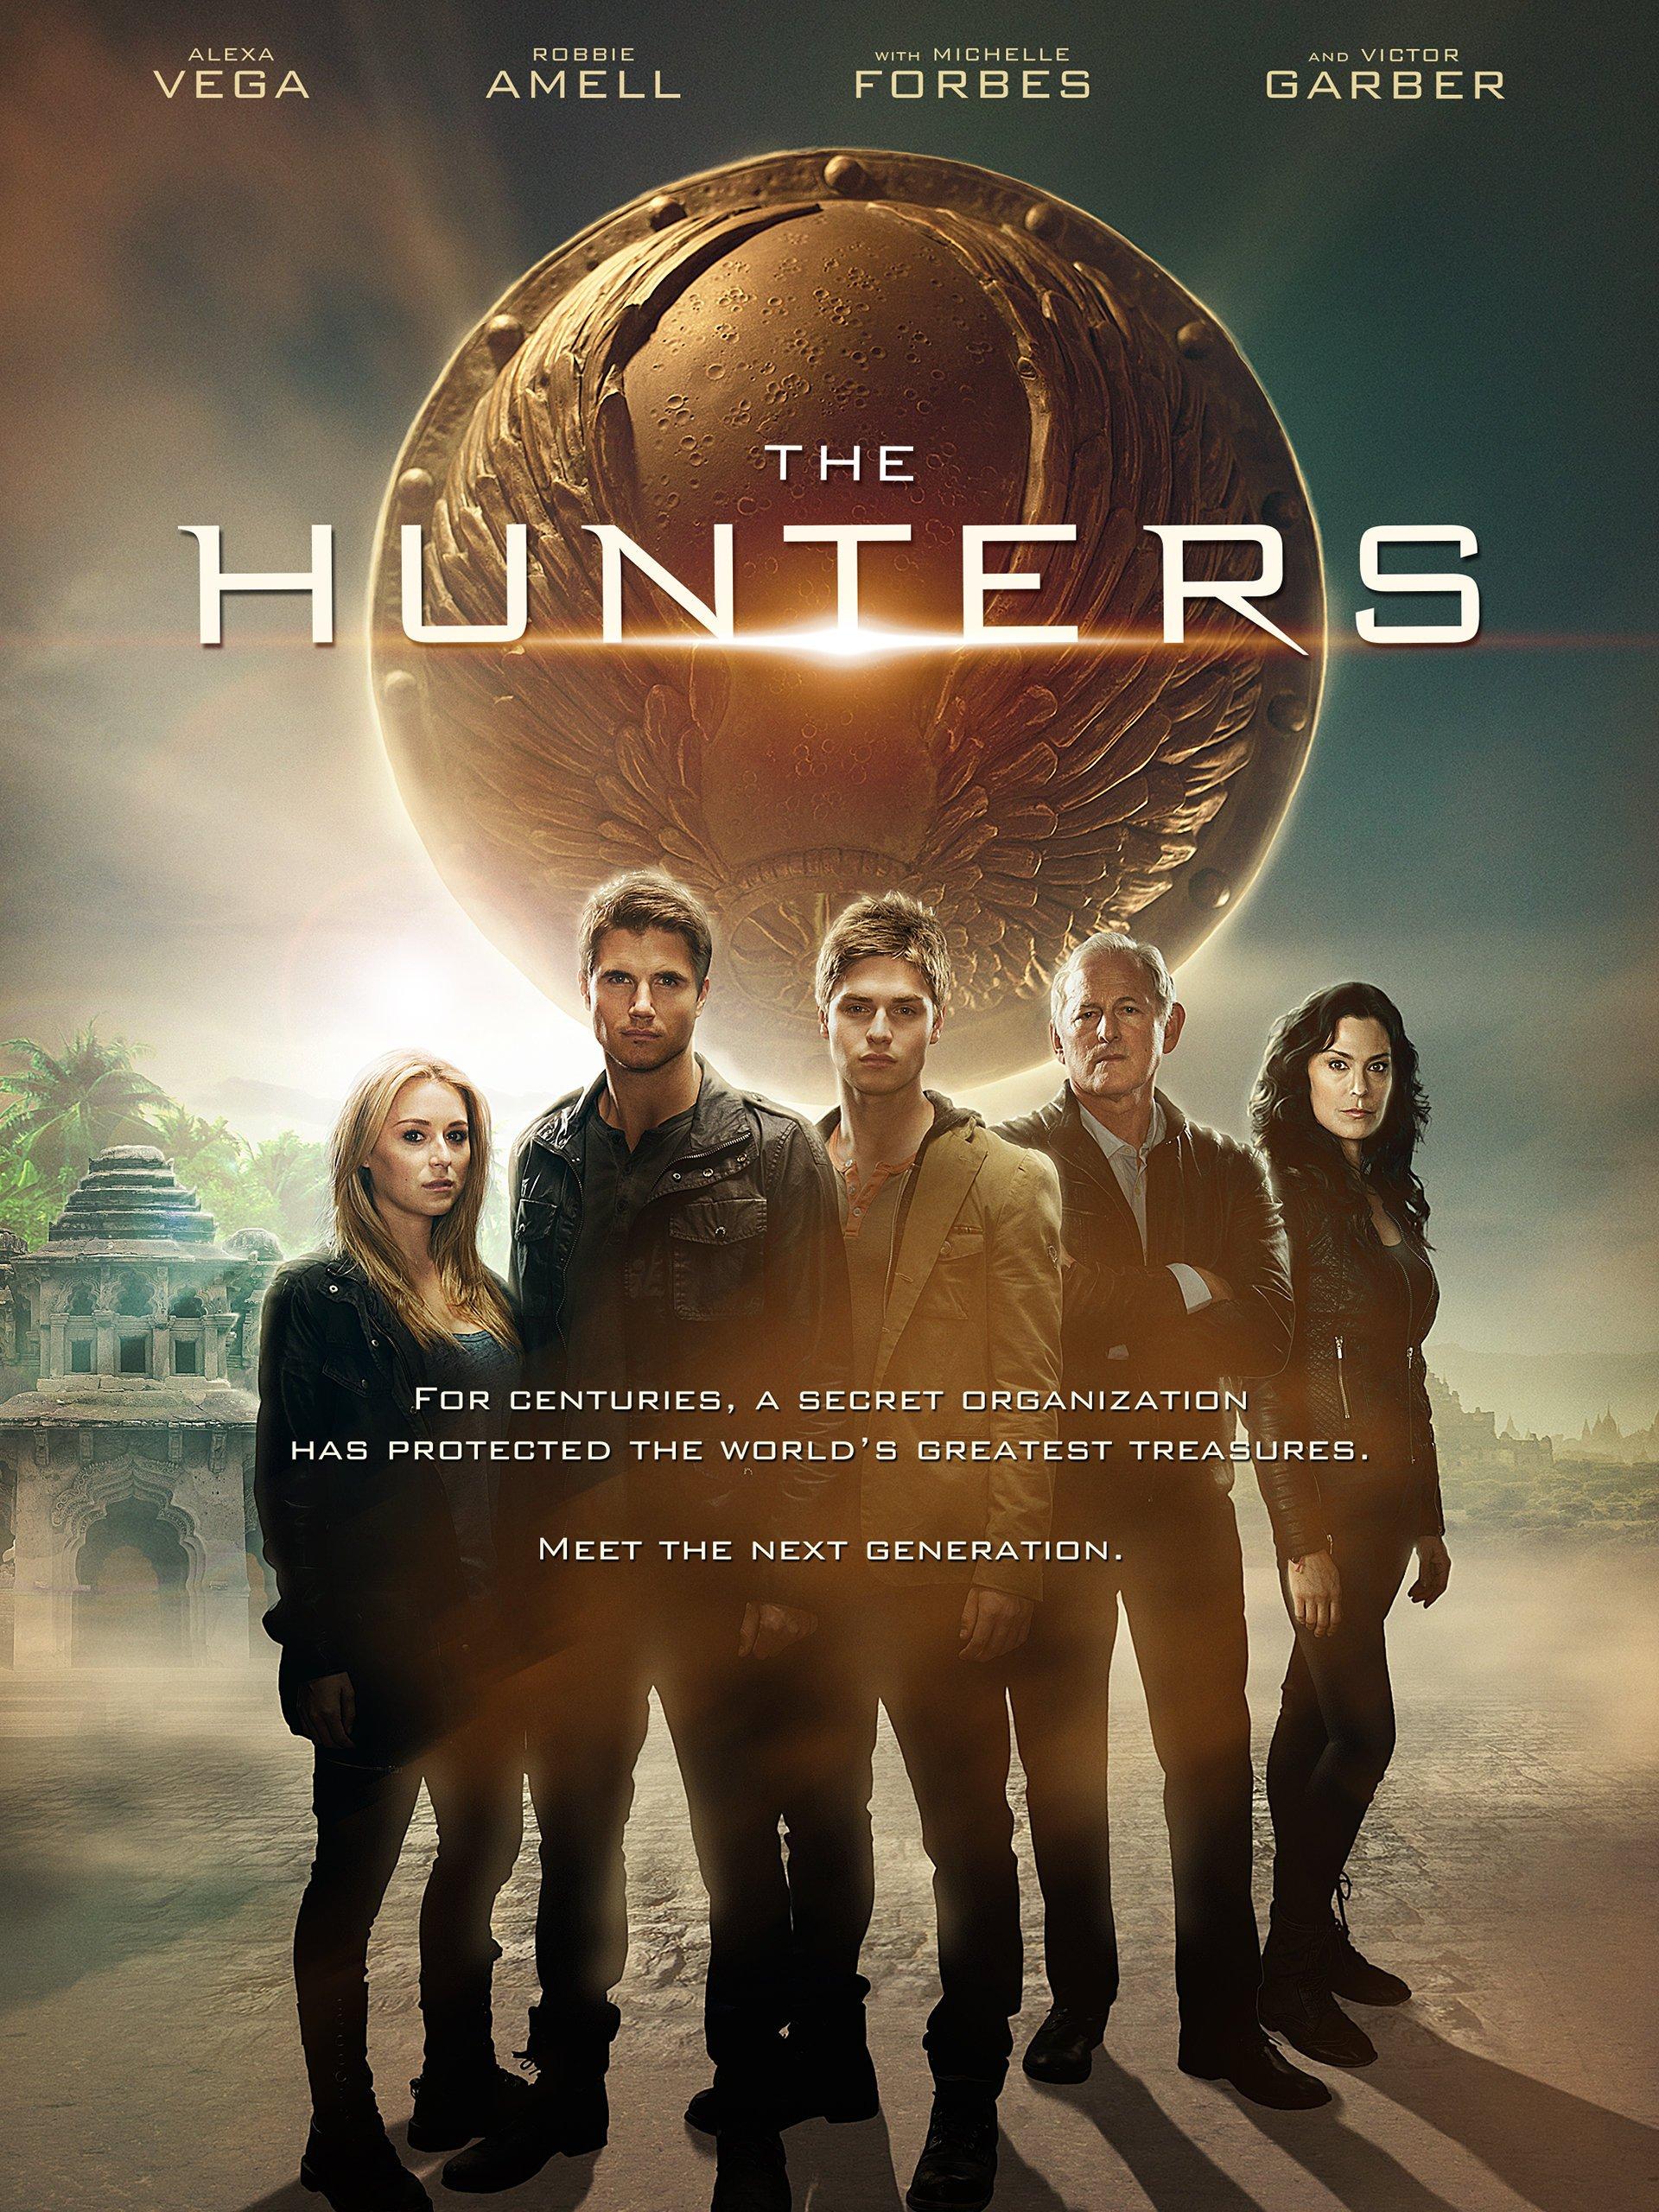 Amazon.com: The Hunters: Victor Garber, Alexa Vega, Robbie Amell ...